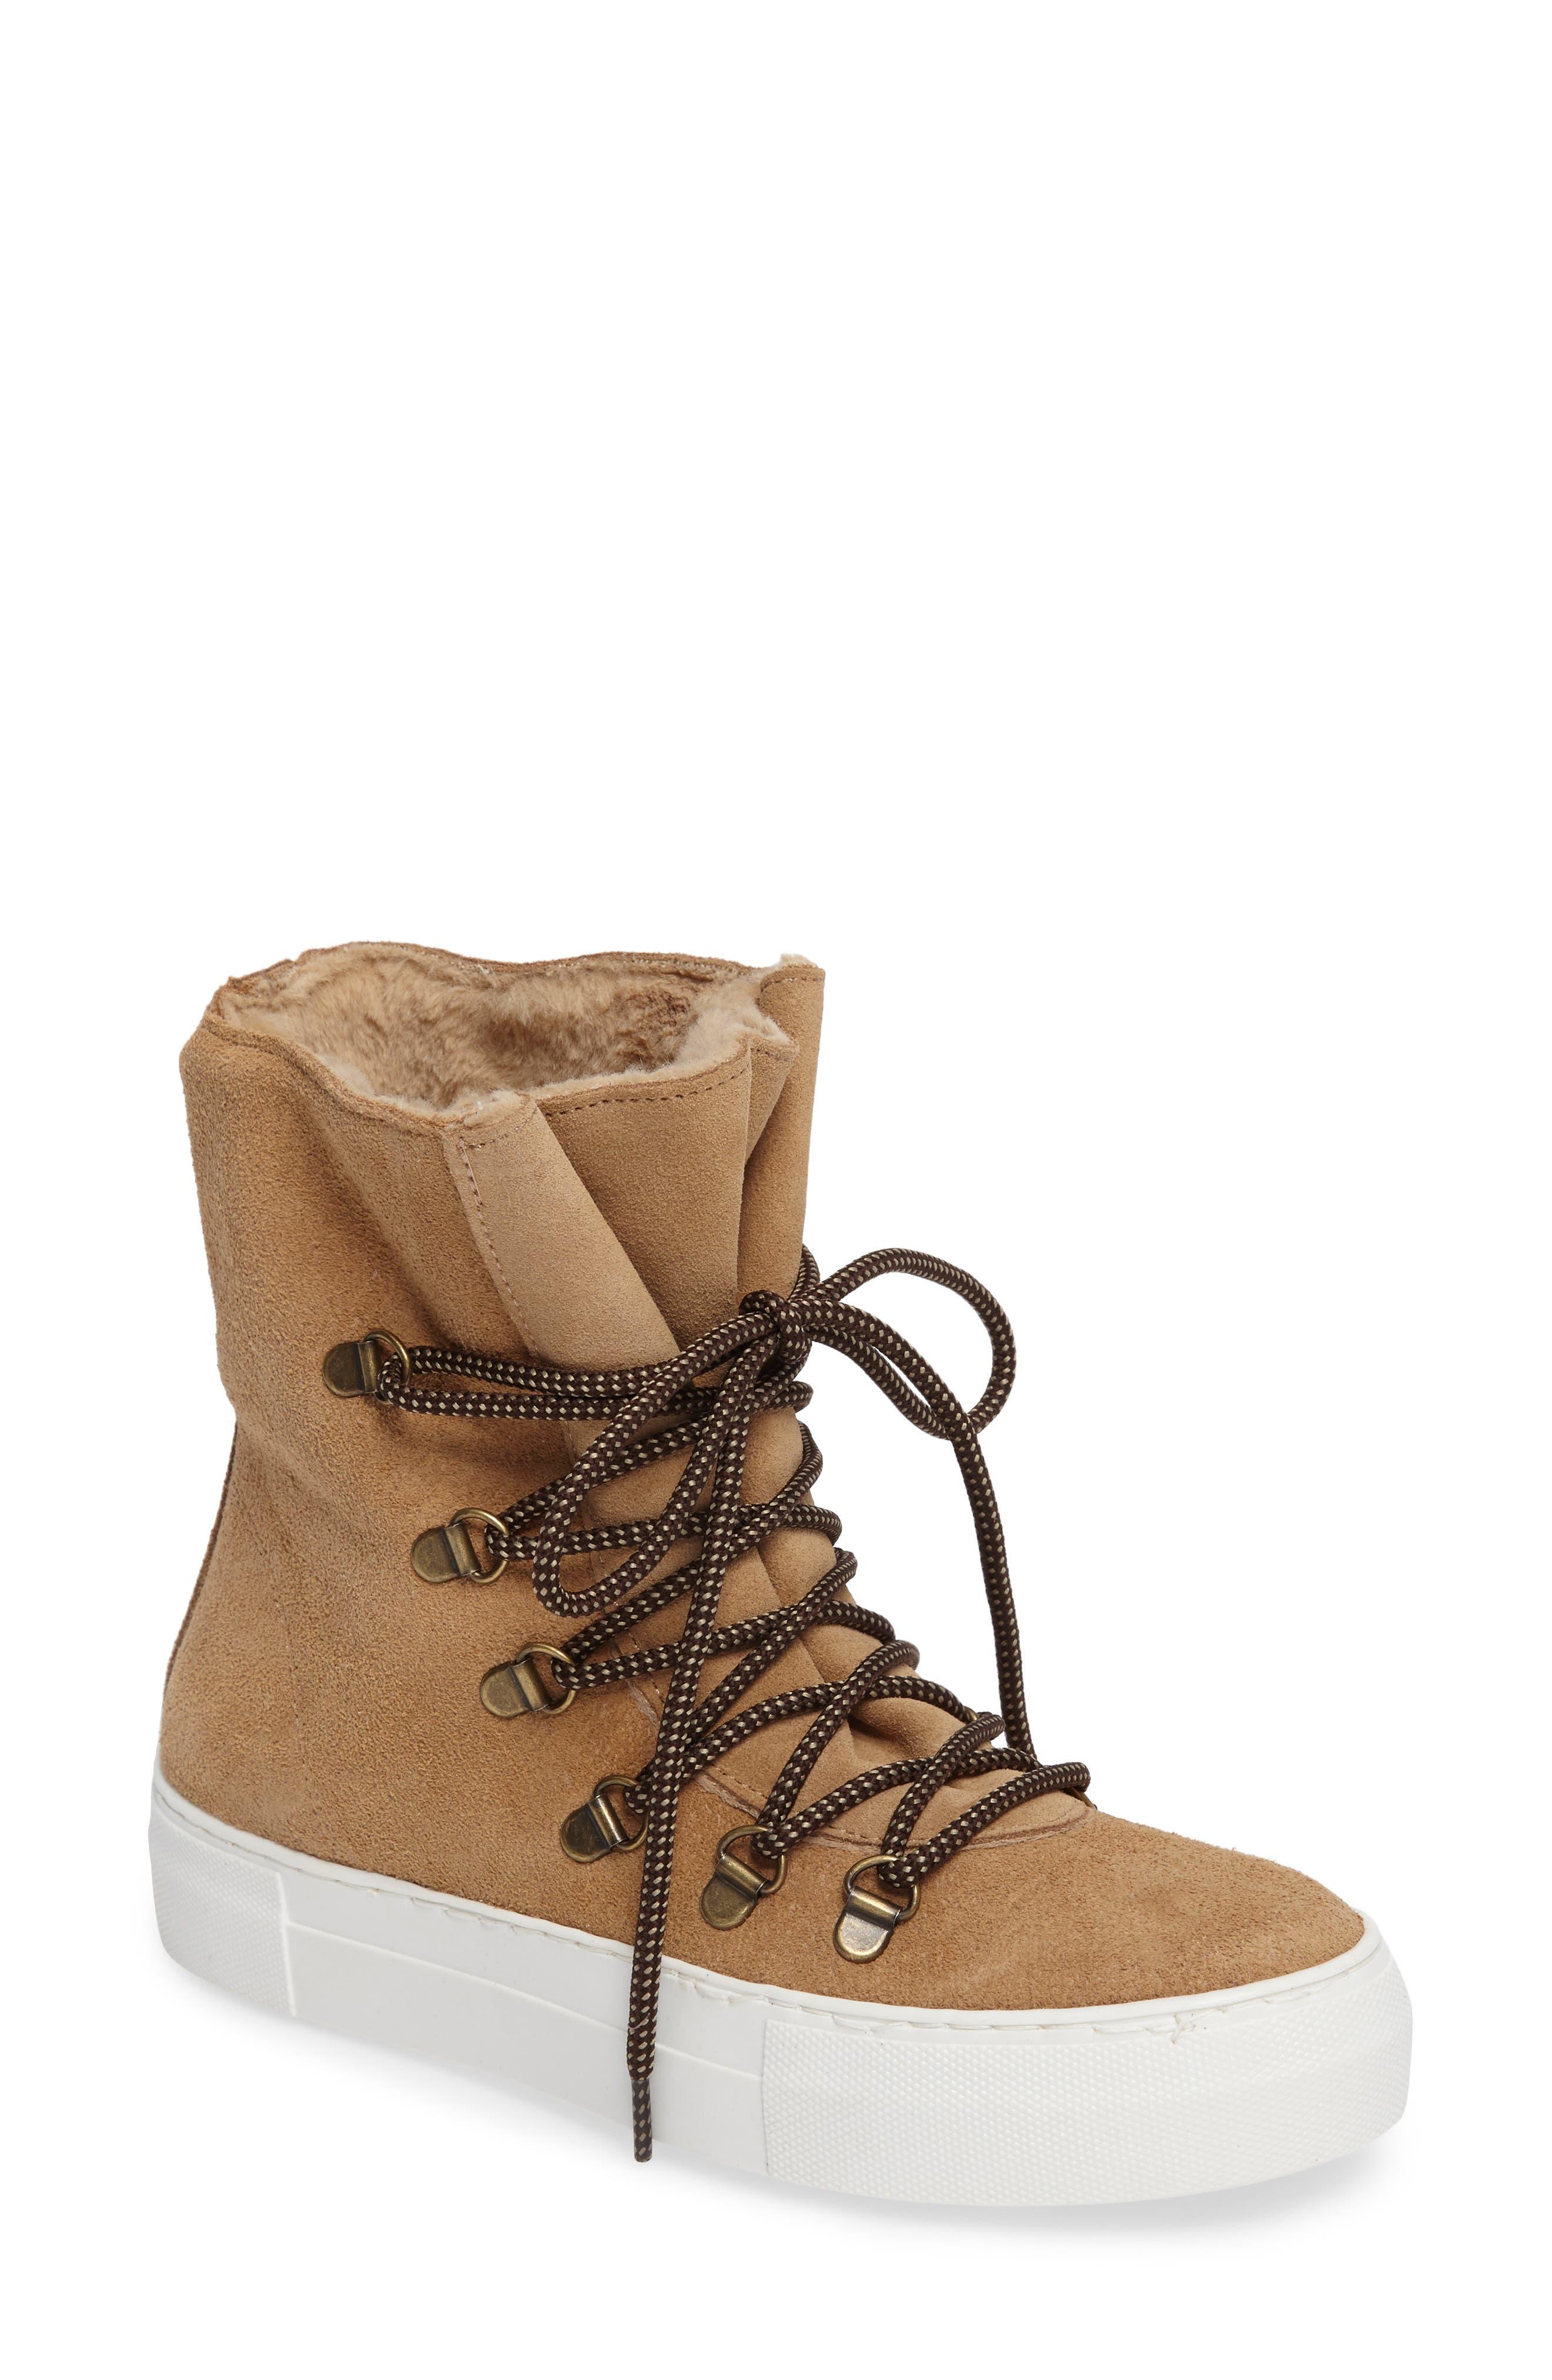 Cimone High Top Sneaker,                         Main,                         color, 263